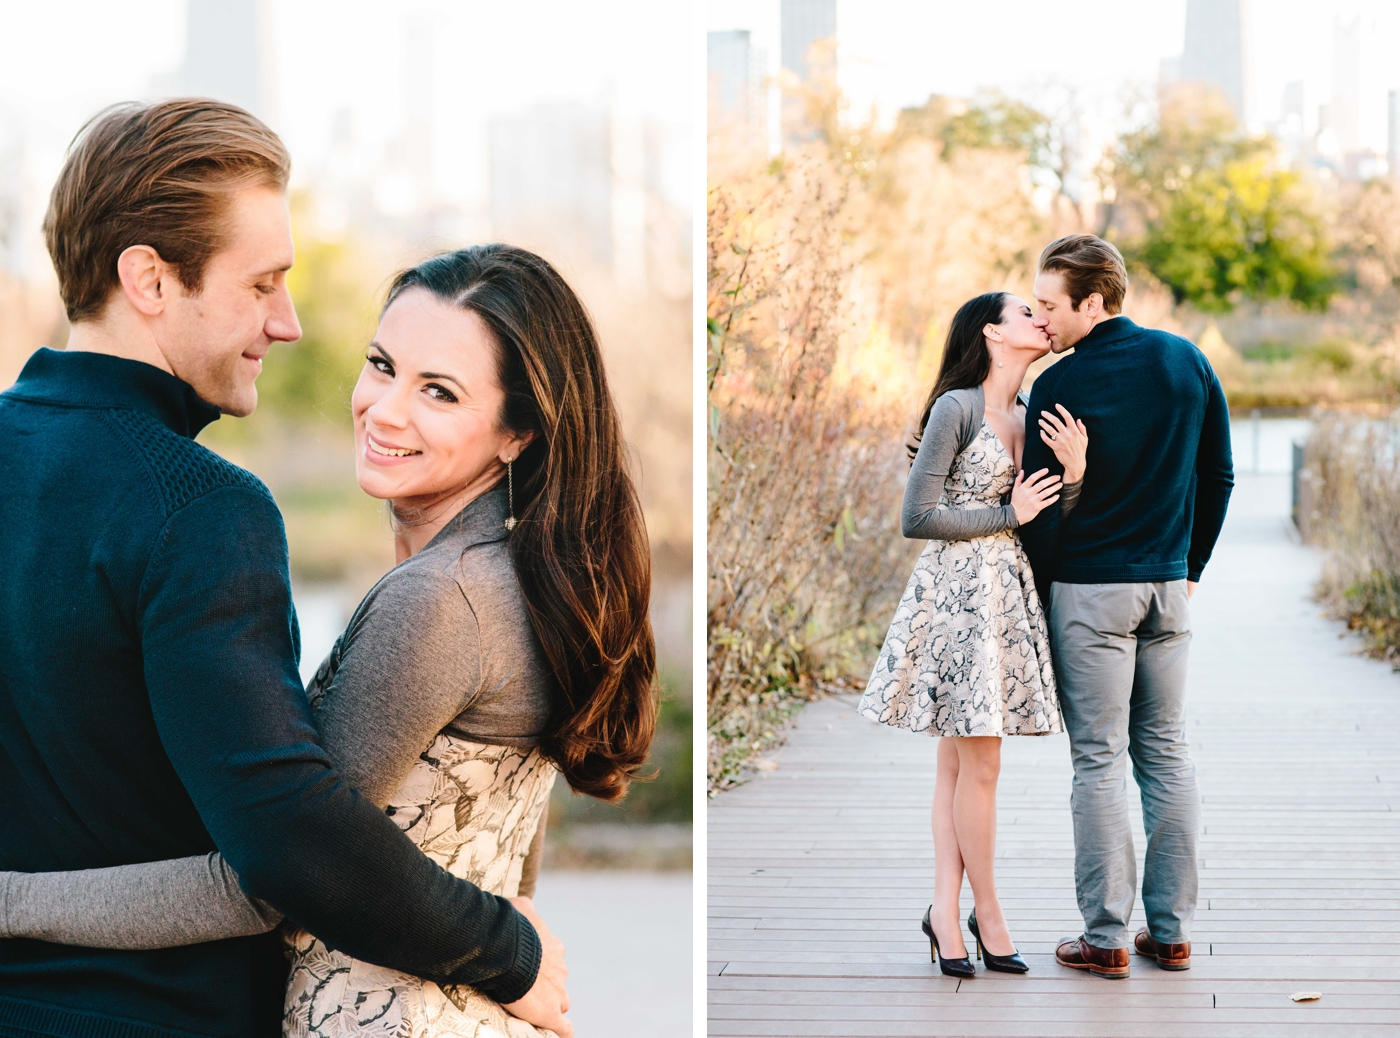 chicago-fine-art-wedding-photography-chriserin15